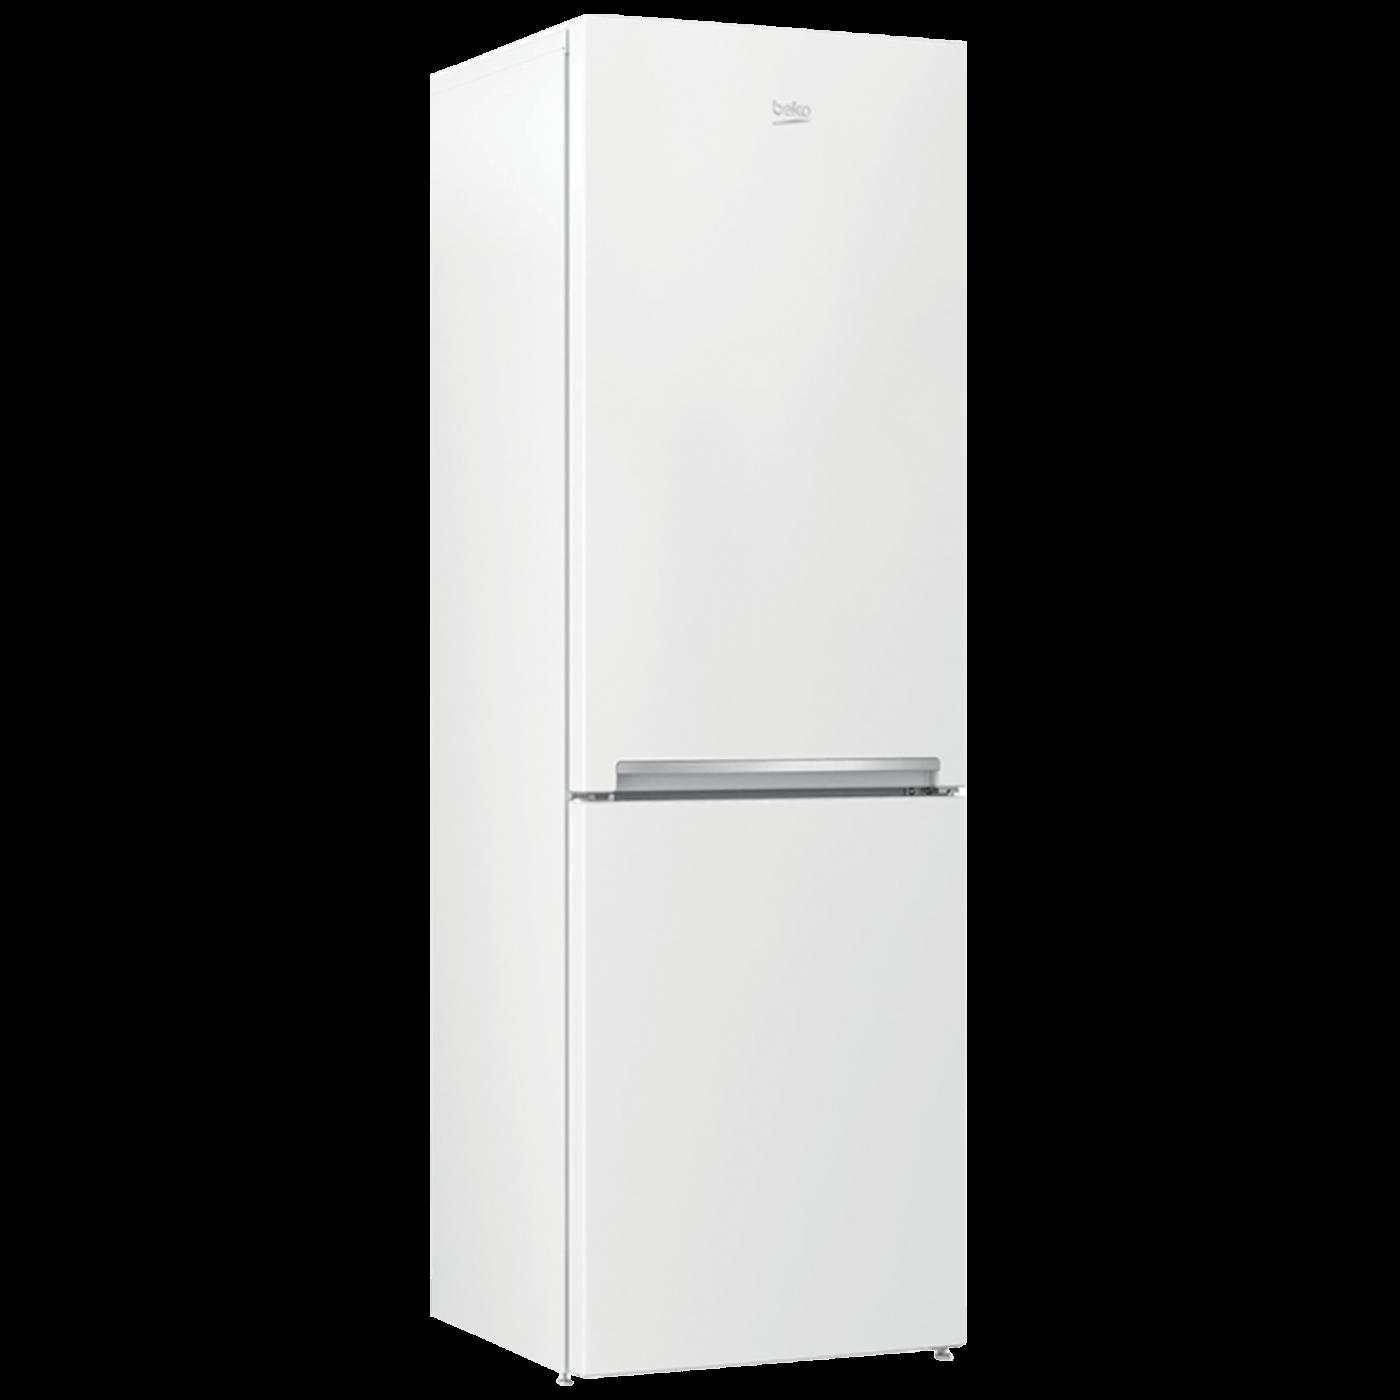 Frižider/Zamrzivač, bruto zapremina 270 lit., A+